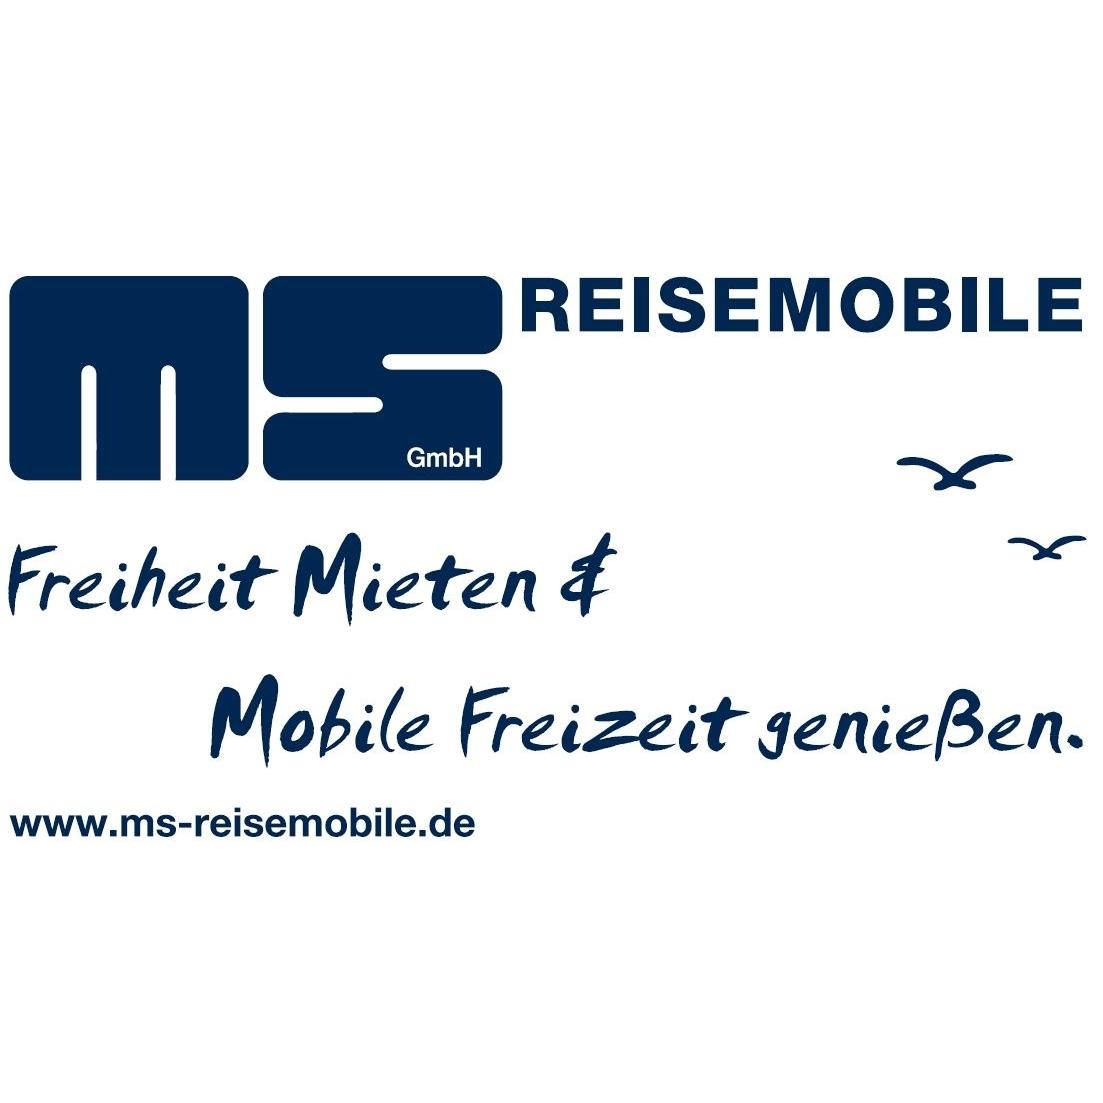 MS Reisemobile GmbH